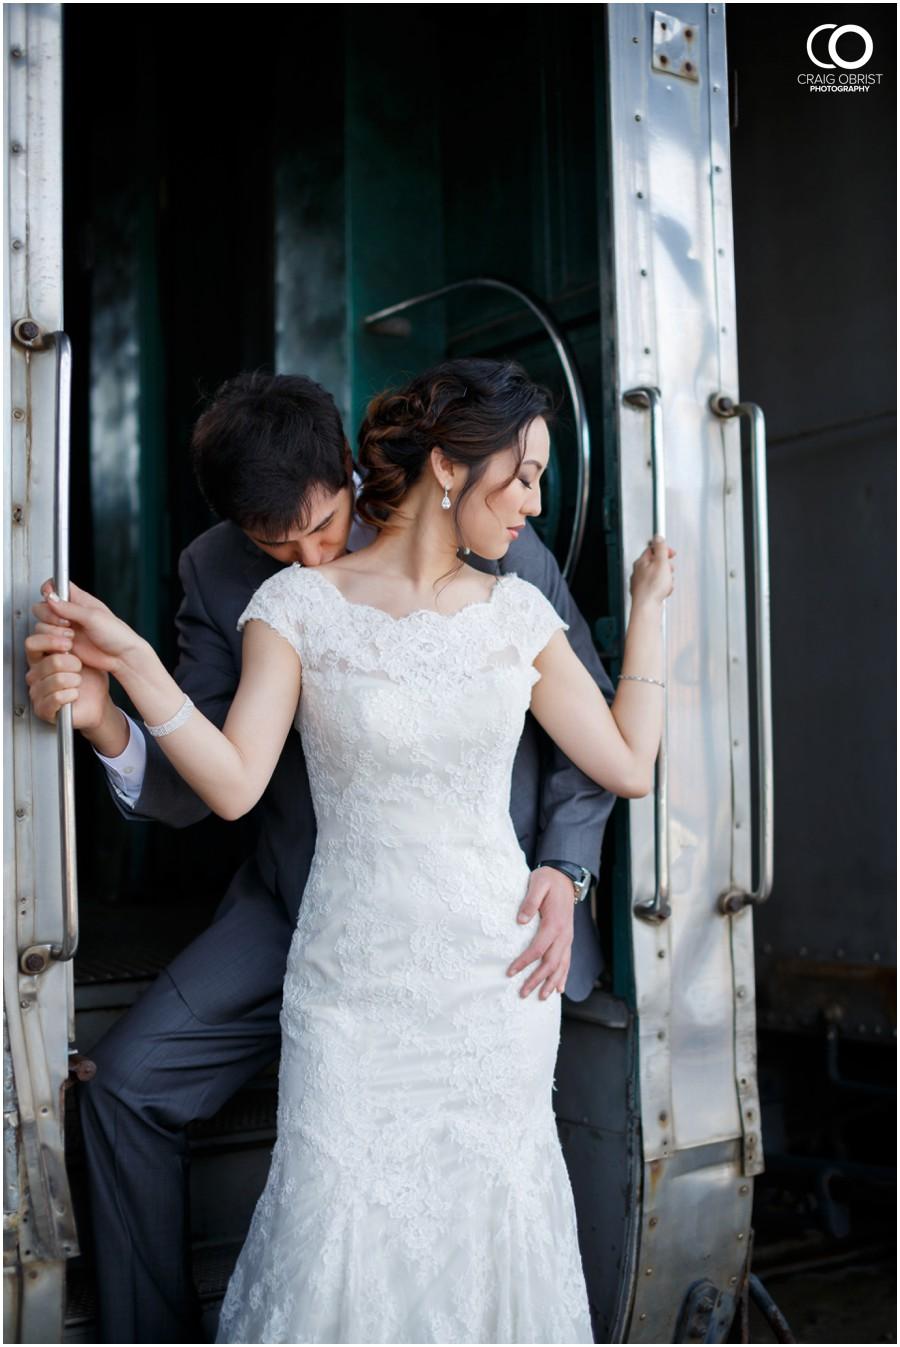 KCPC-Wedding-Duluth-Georigia-Train-museum_0035.jpg